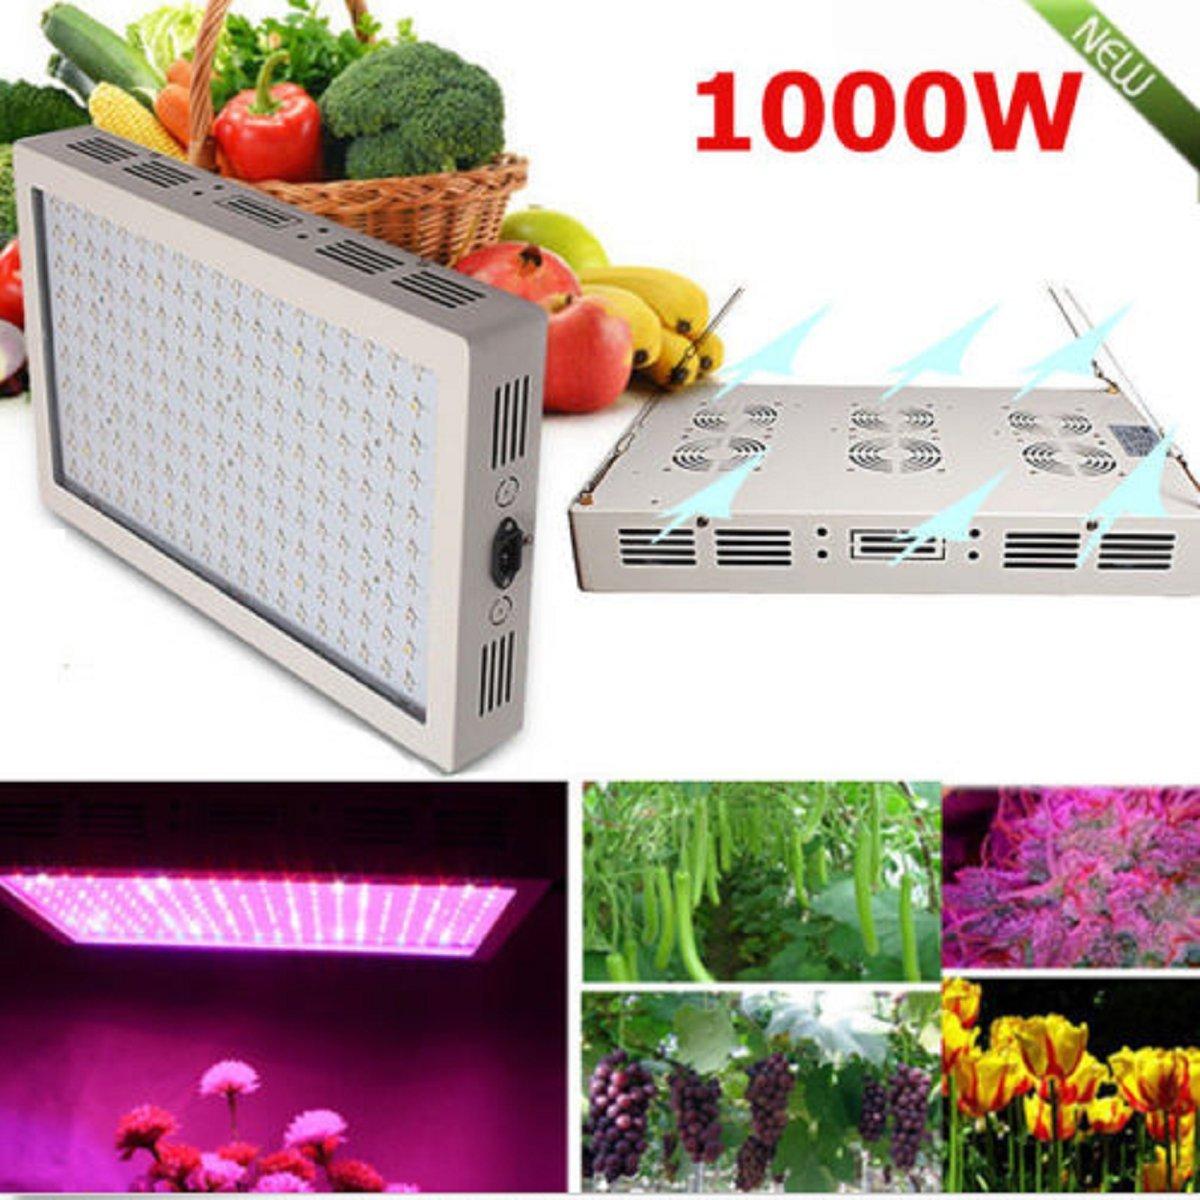 USA Premium Store 1000W Full Spectrum LED Grow Light dual Chip Medical Plant Veg Bloom Plant Panel by USA Premium Store